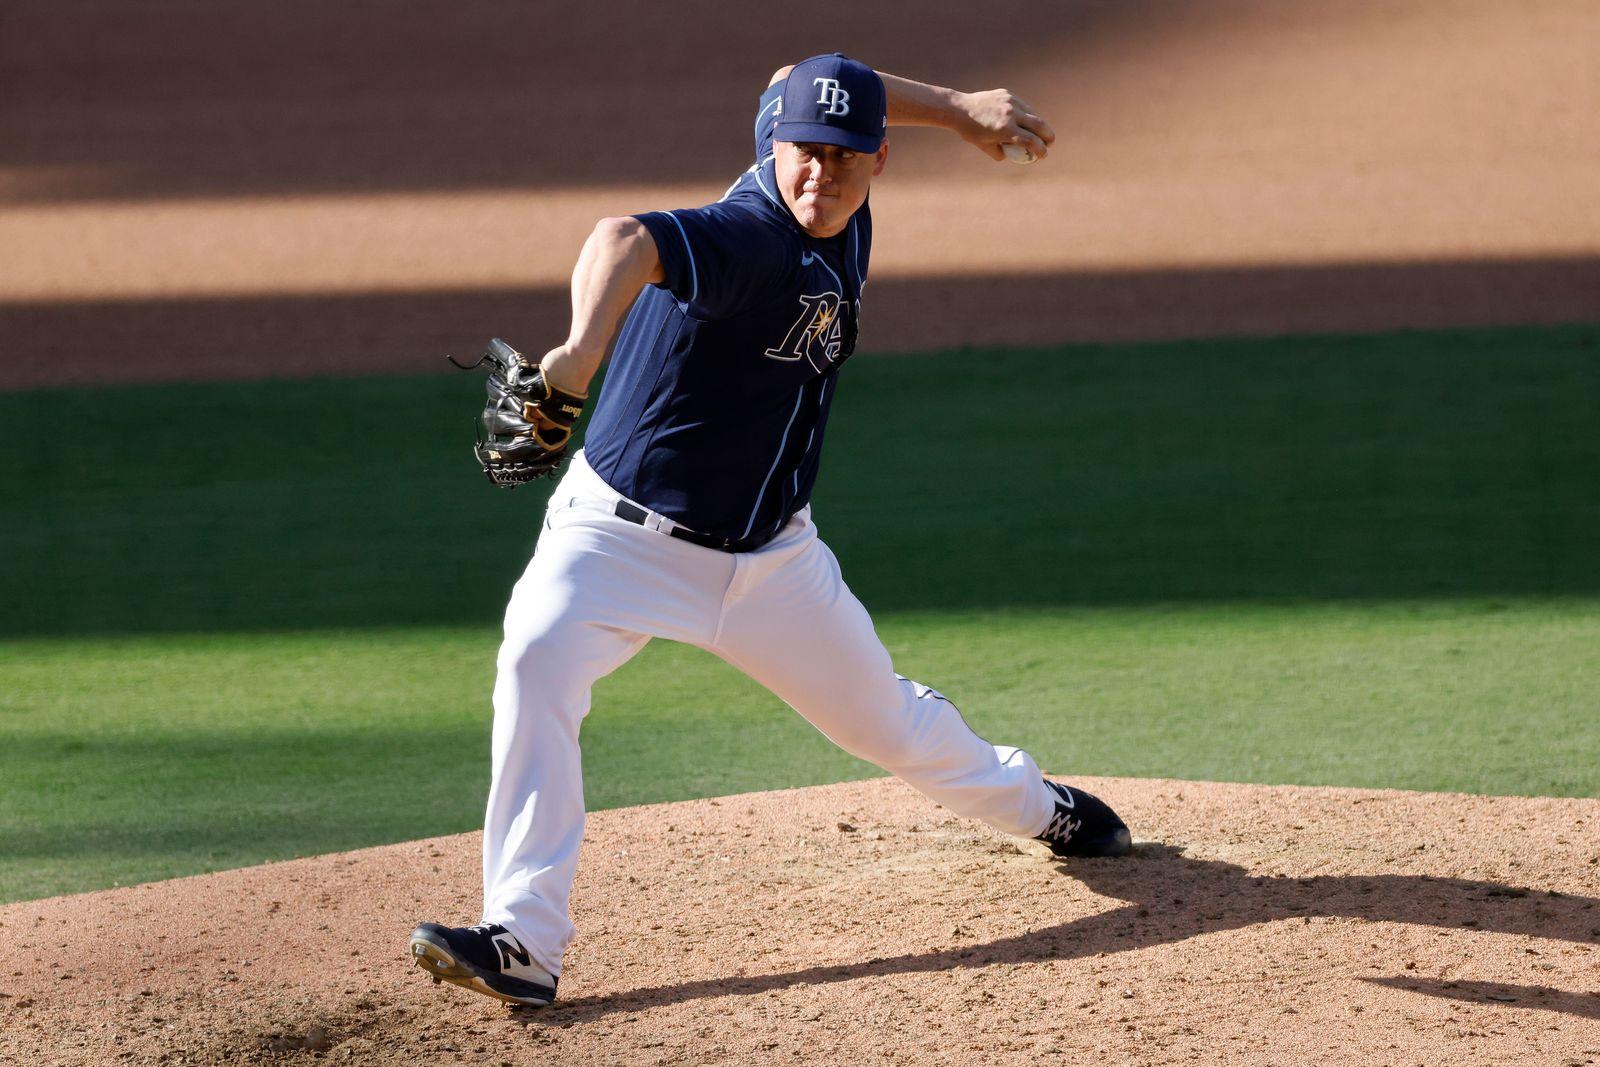 Houston Astros at Tampa Bay Rays, San Diego, USA - 12 Oct 2020